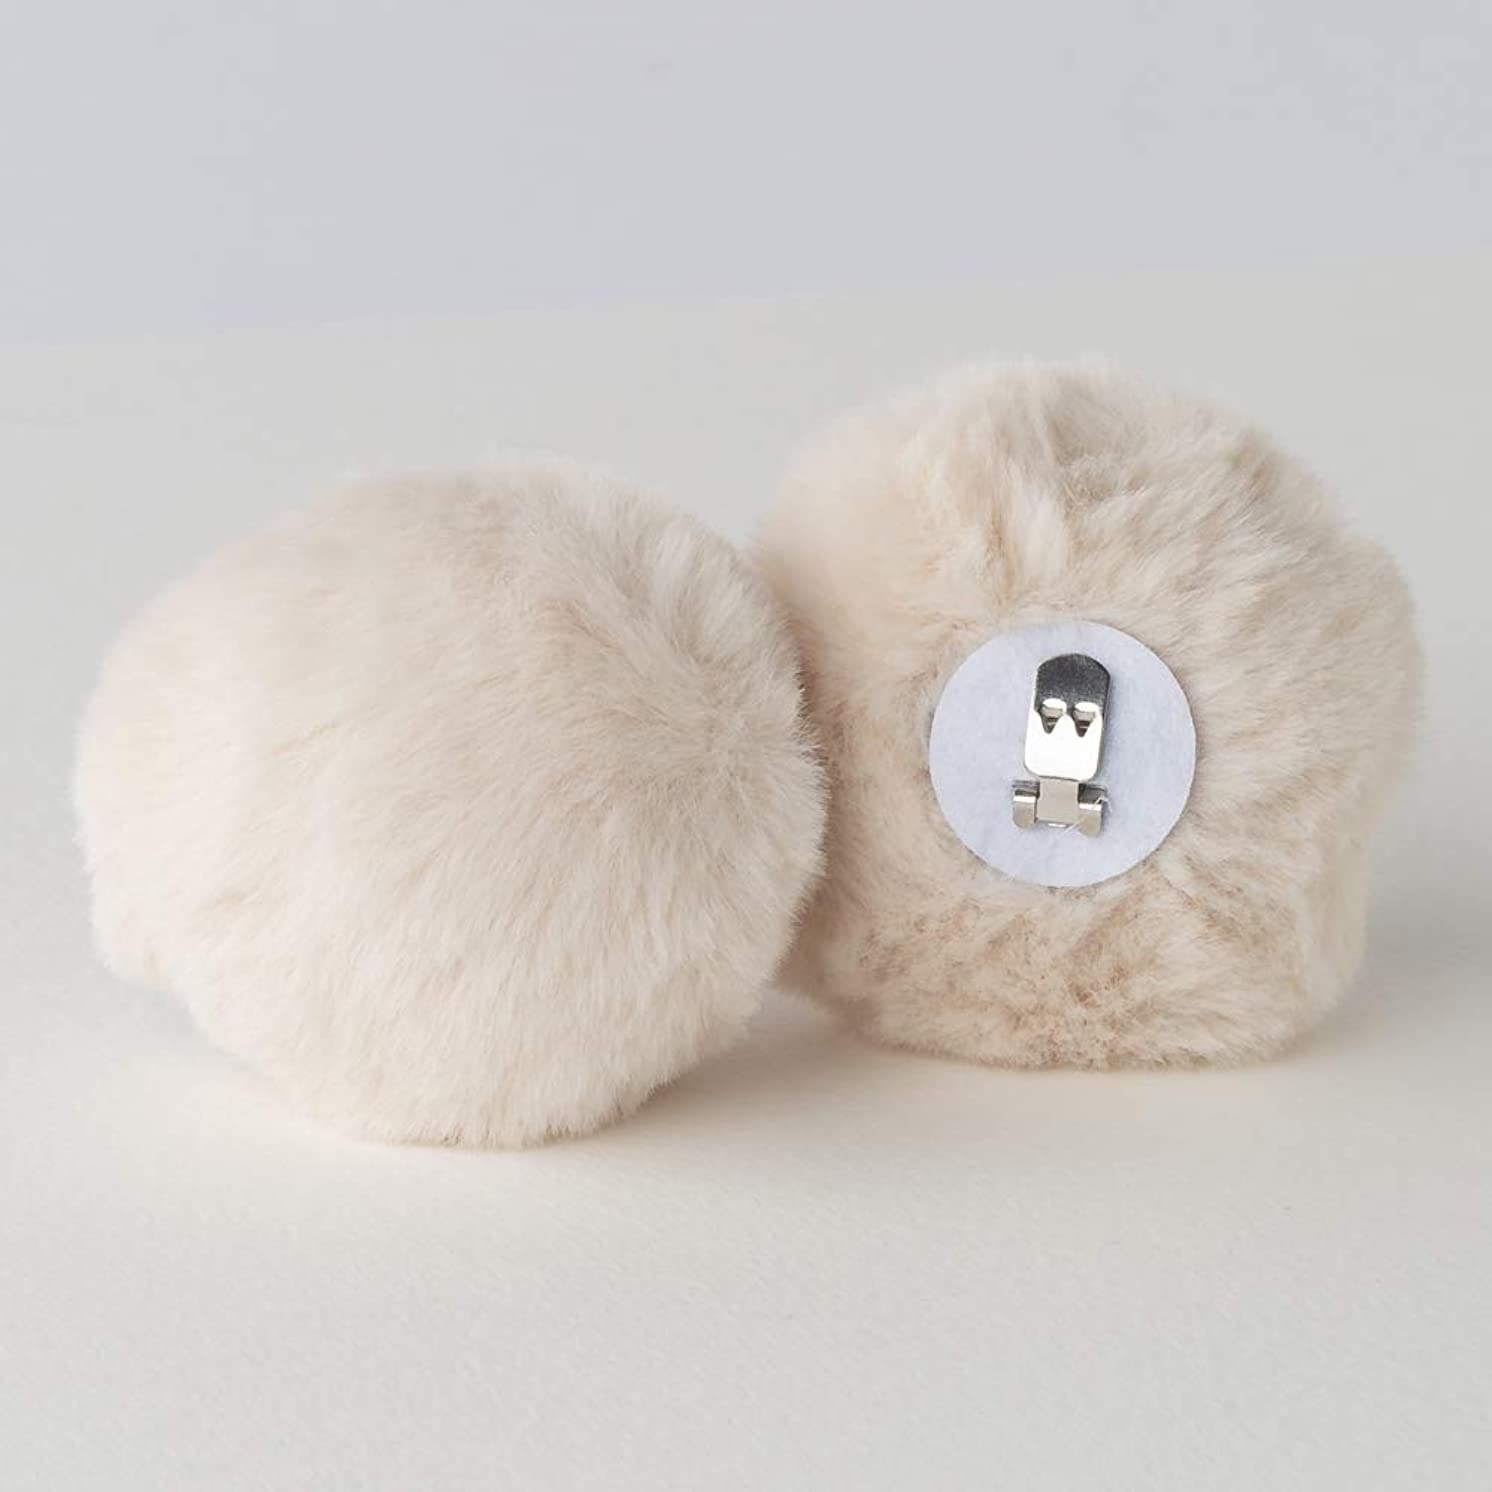 Shoe Clips Removable Fur Pom Poms Set of 2